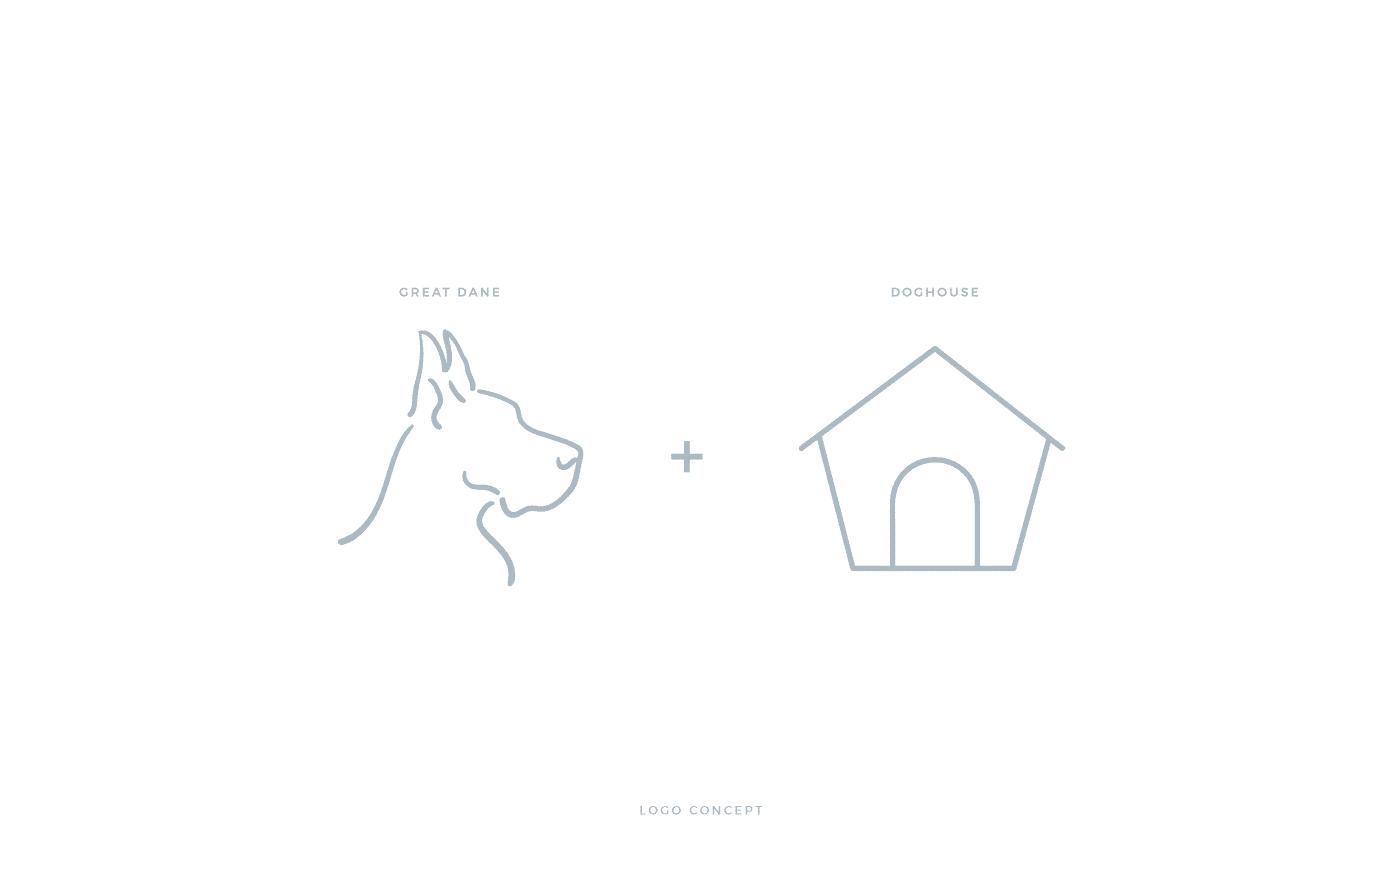 Ragdoll House Logo Concept